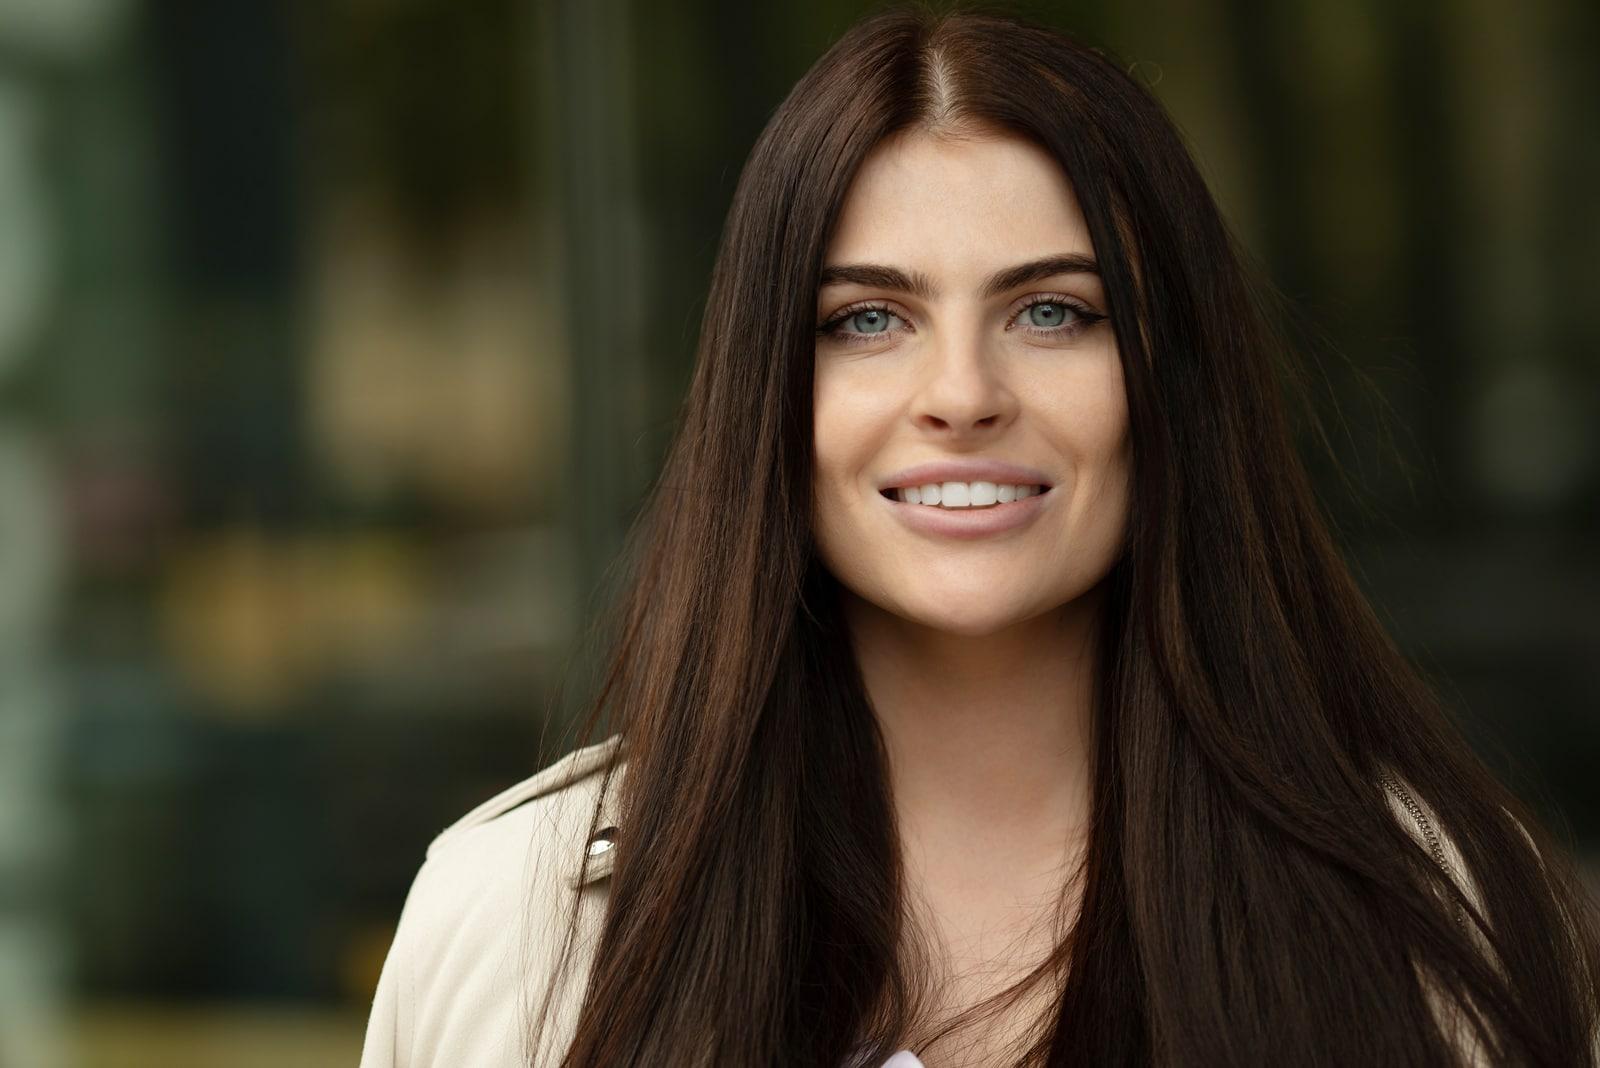 portrait of a beautiful smiling brunette